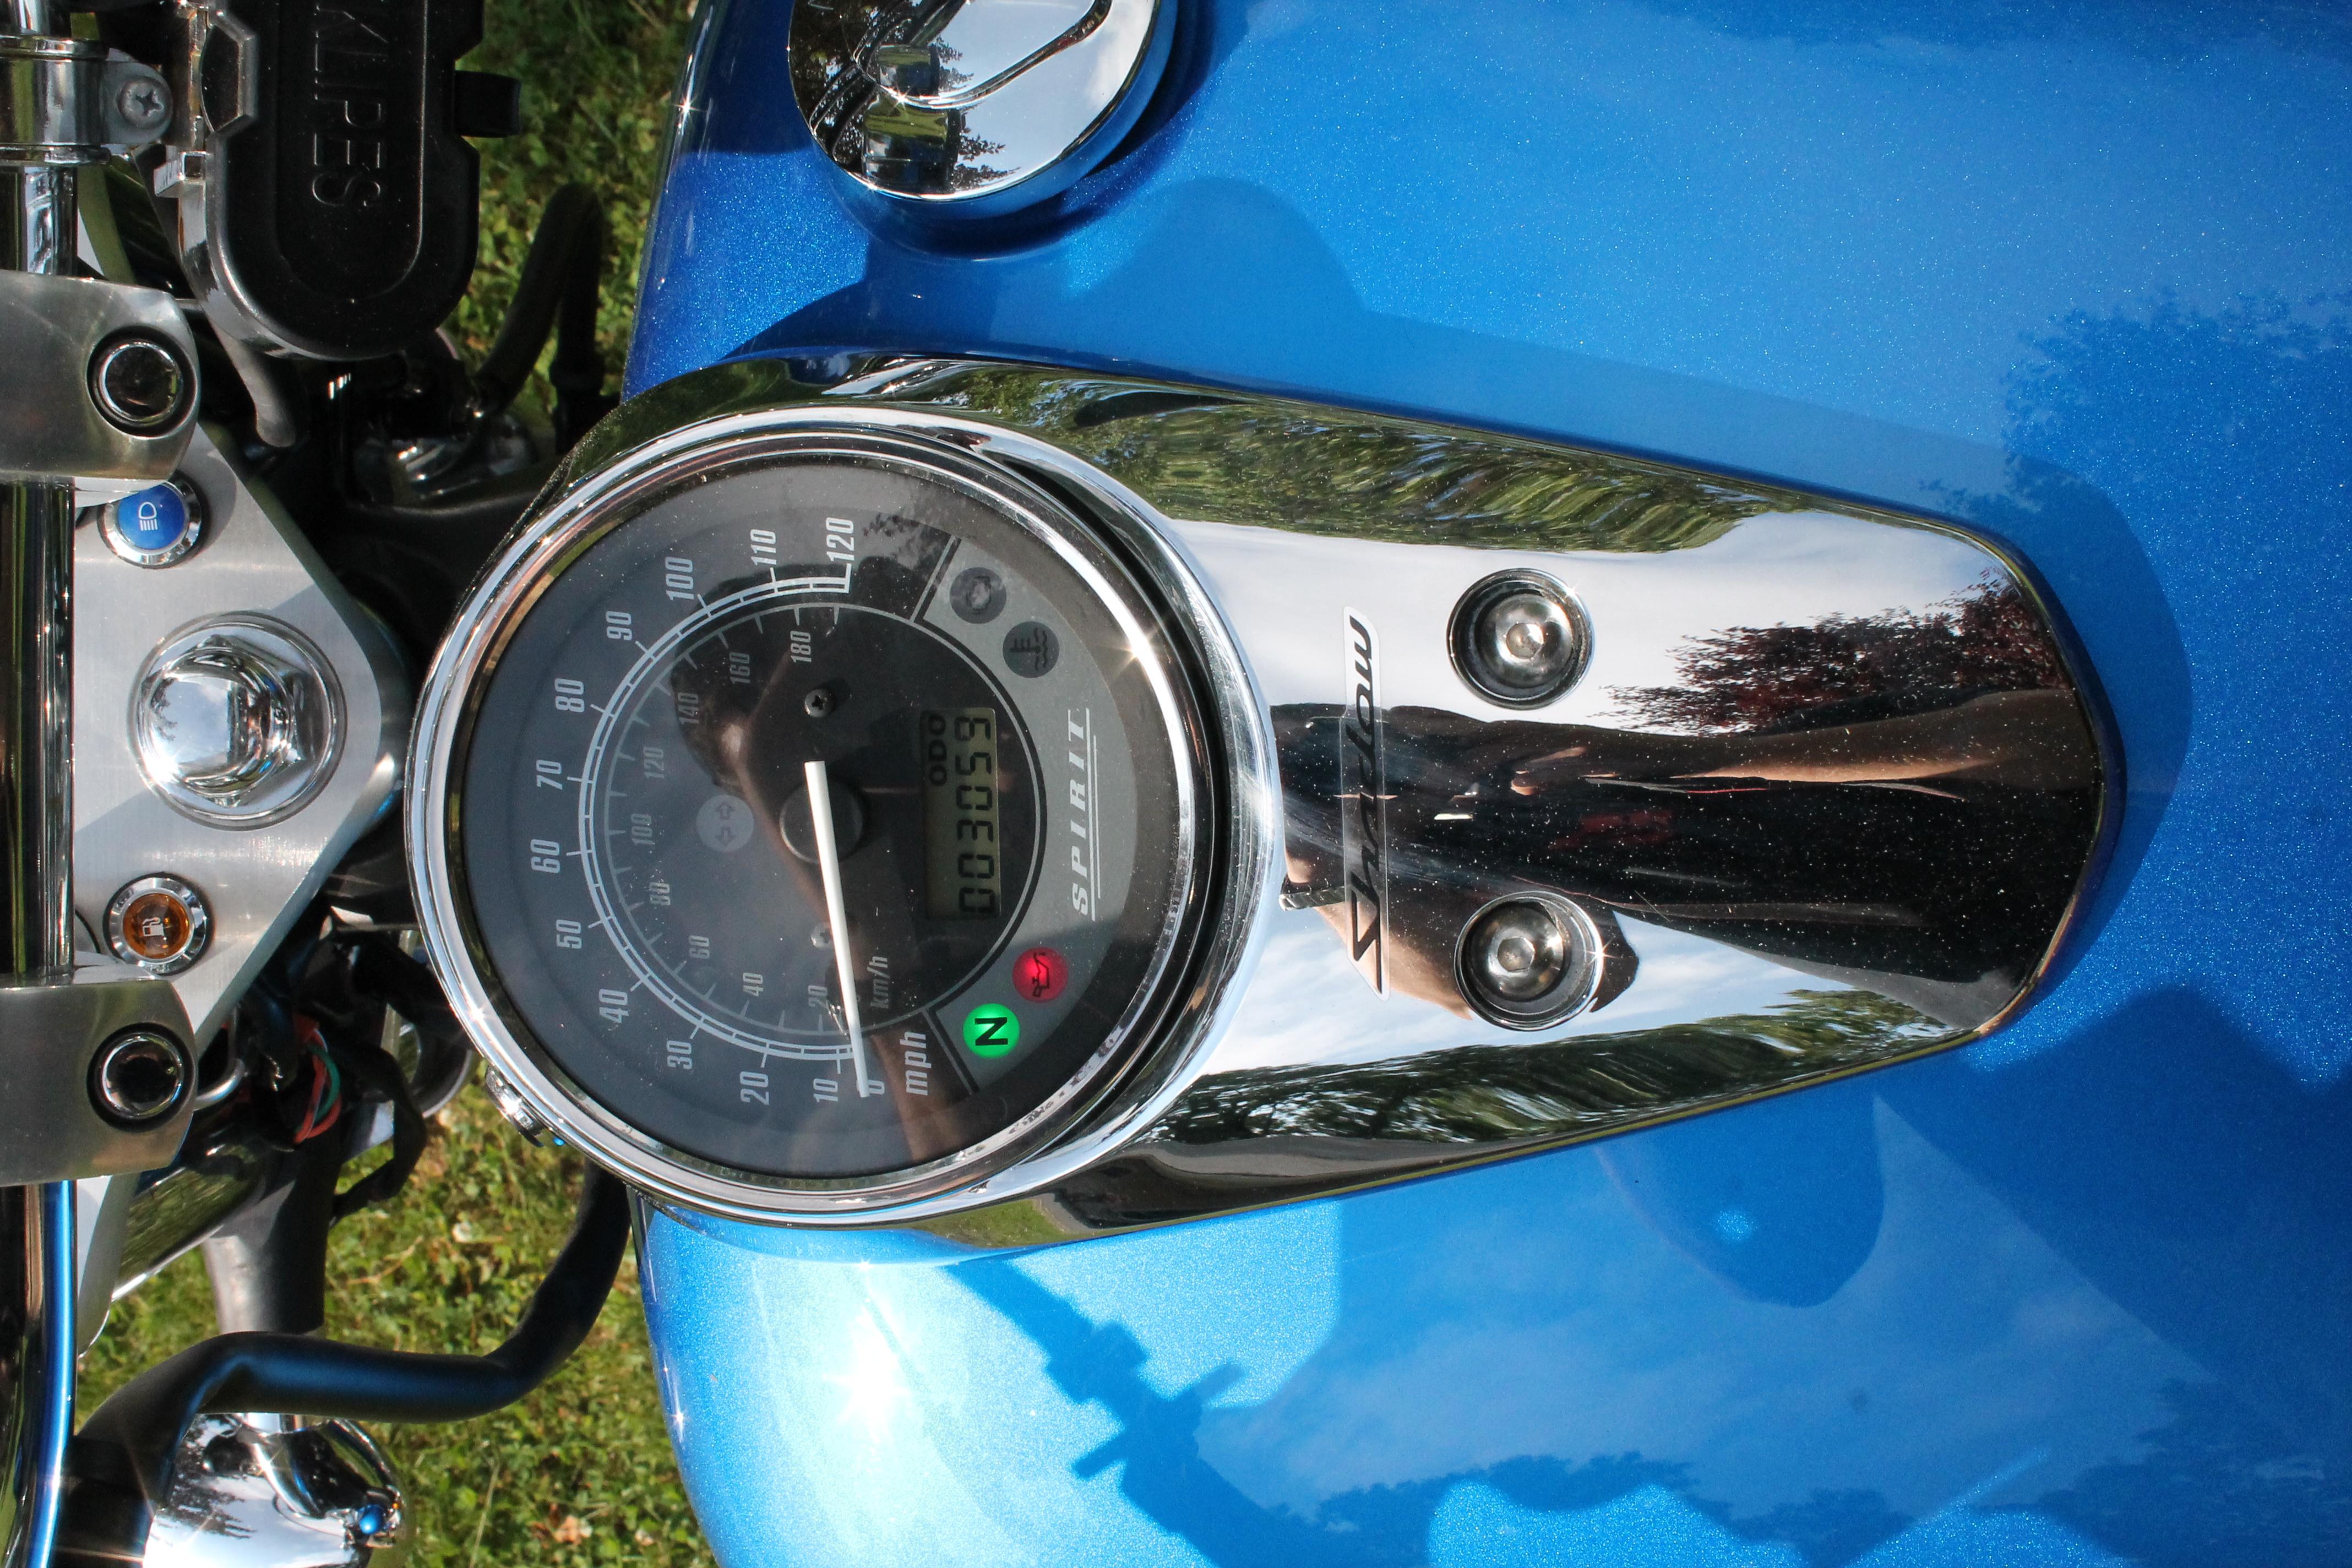 2014 Honda Shadow 750 Spirit | blackmarketbikez